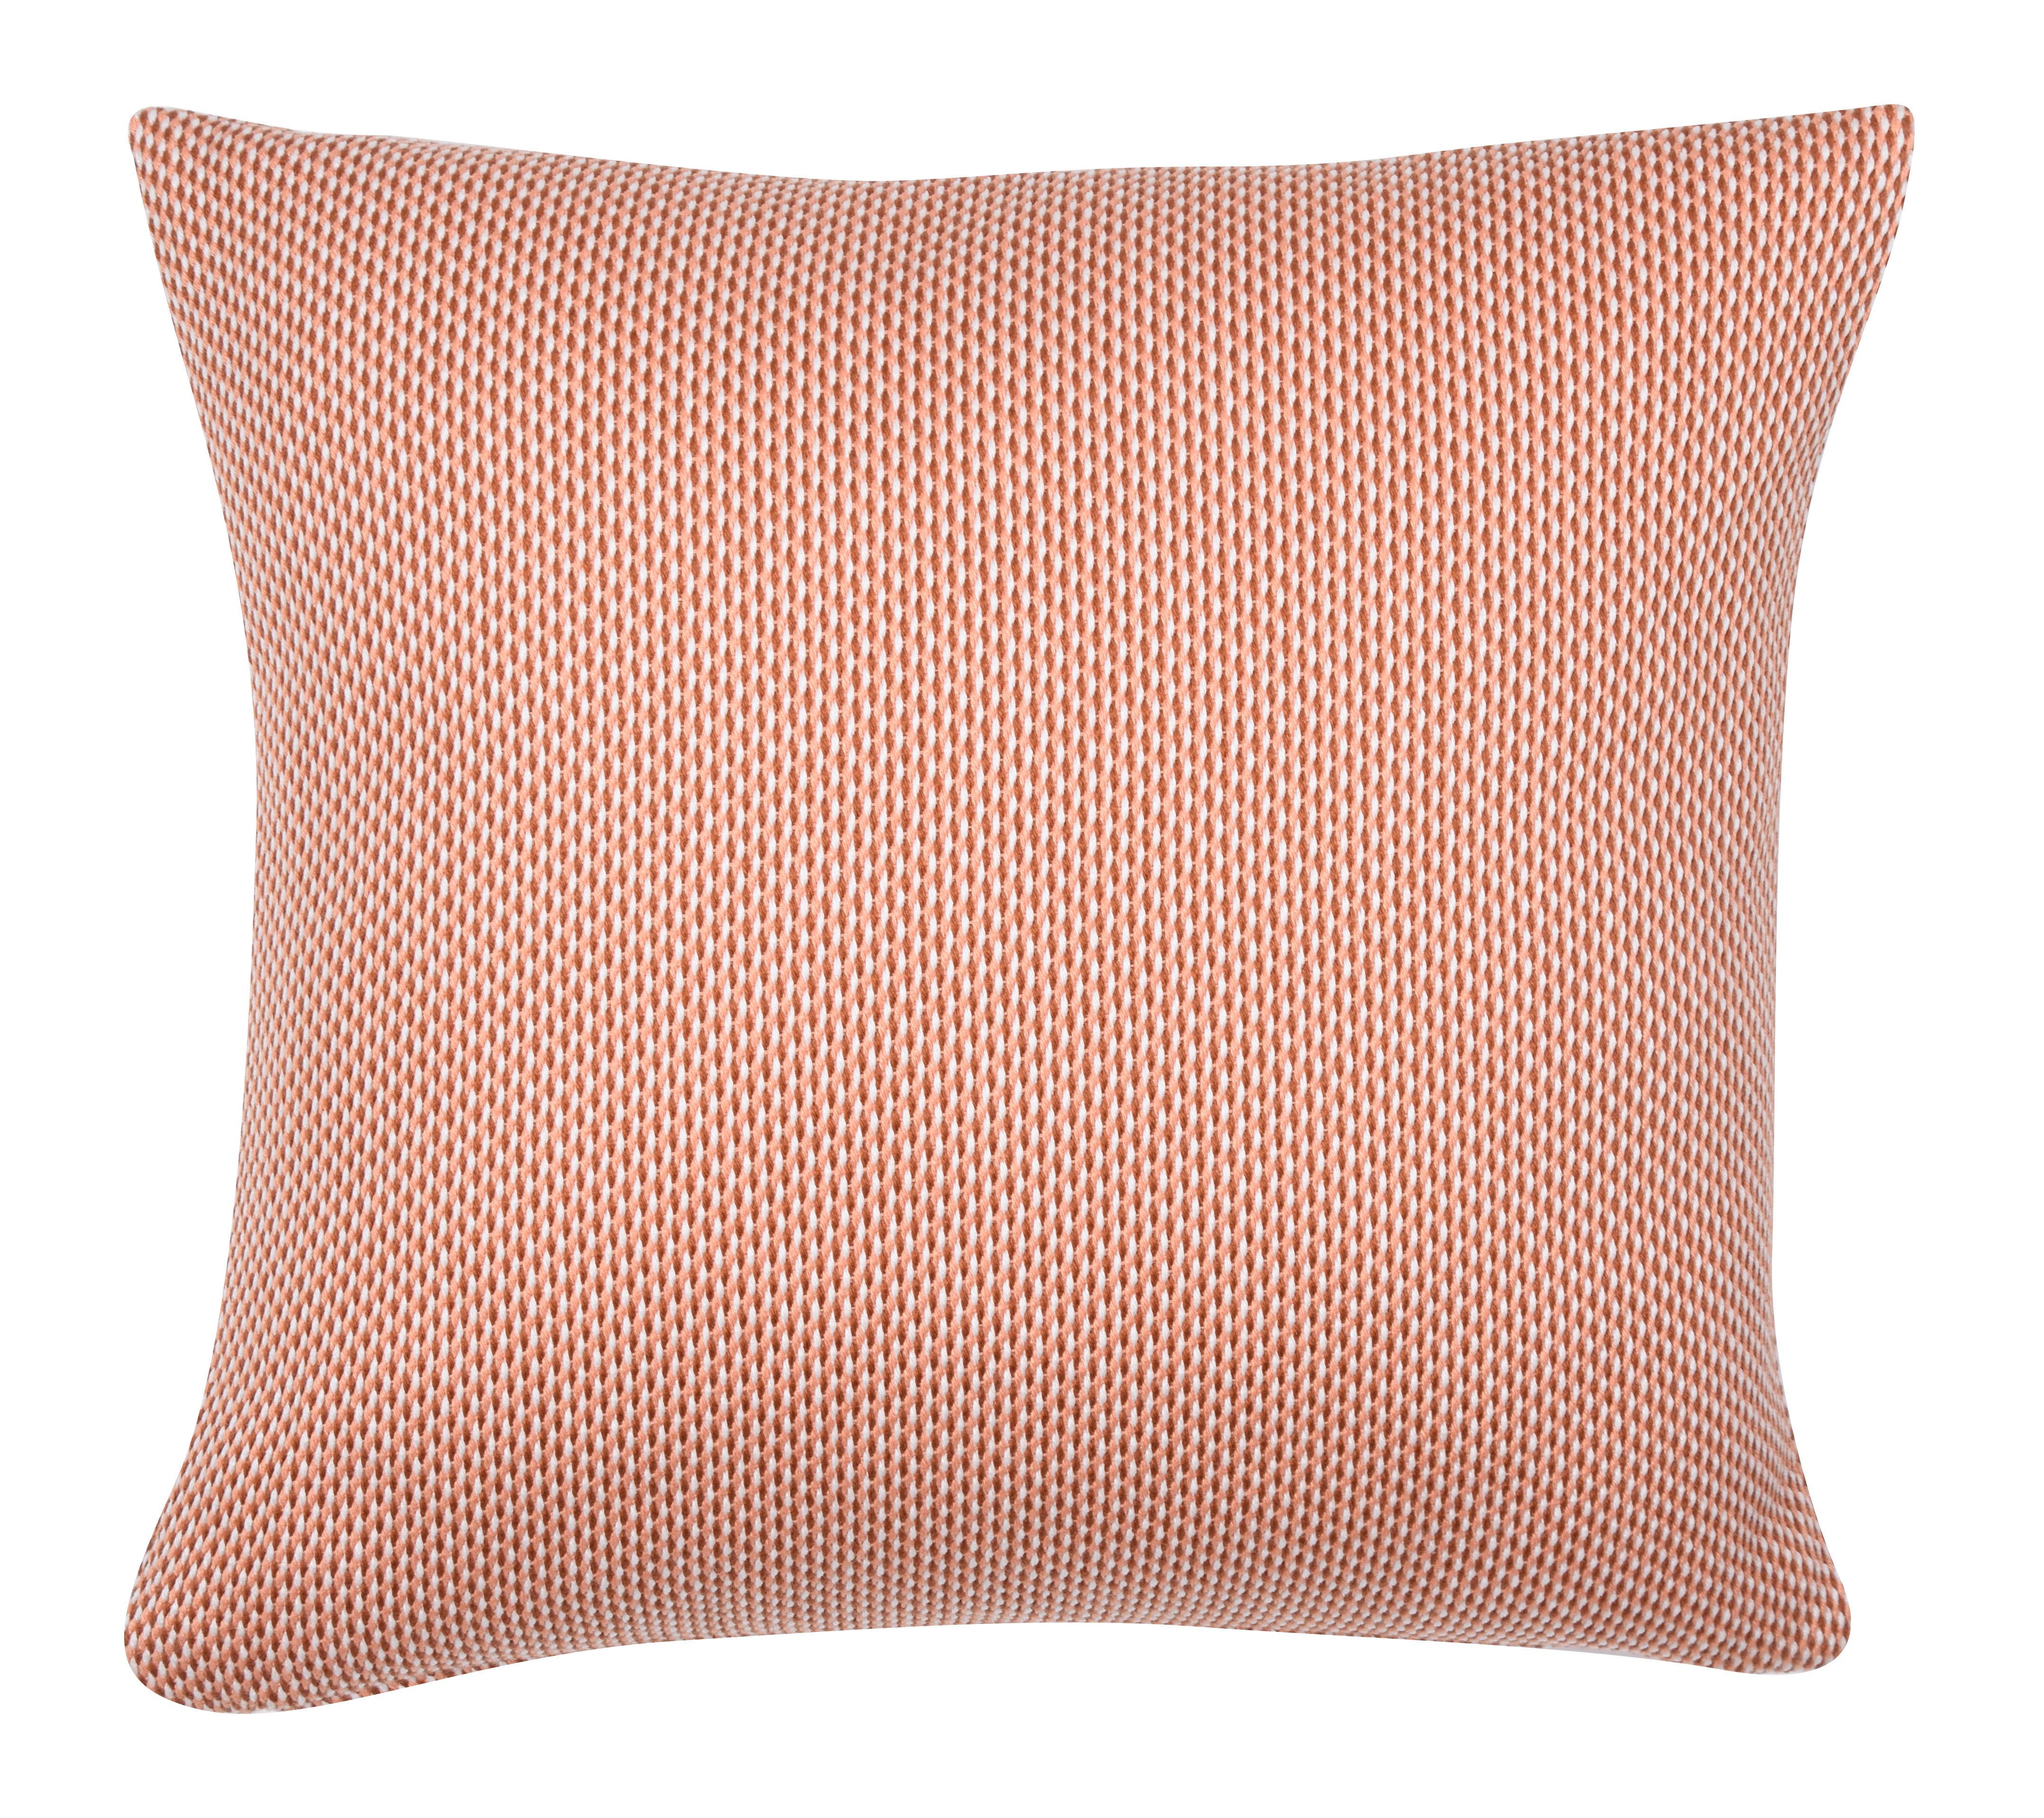 Decoration - Cushions & Poufs - Evasion Outdoor cushion - / 44 x 44 cm by Fermob - Atacama - Acrylic